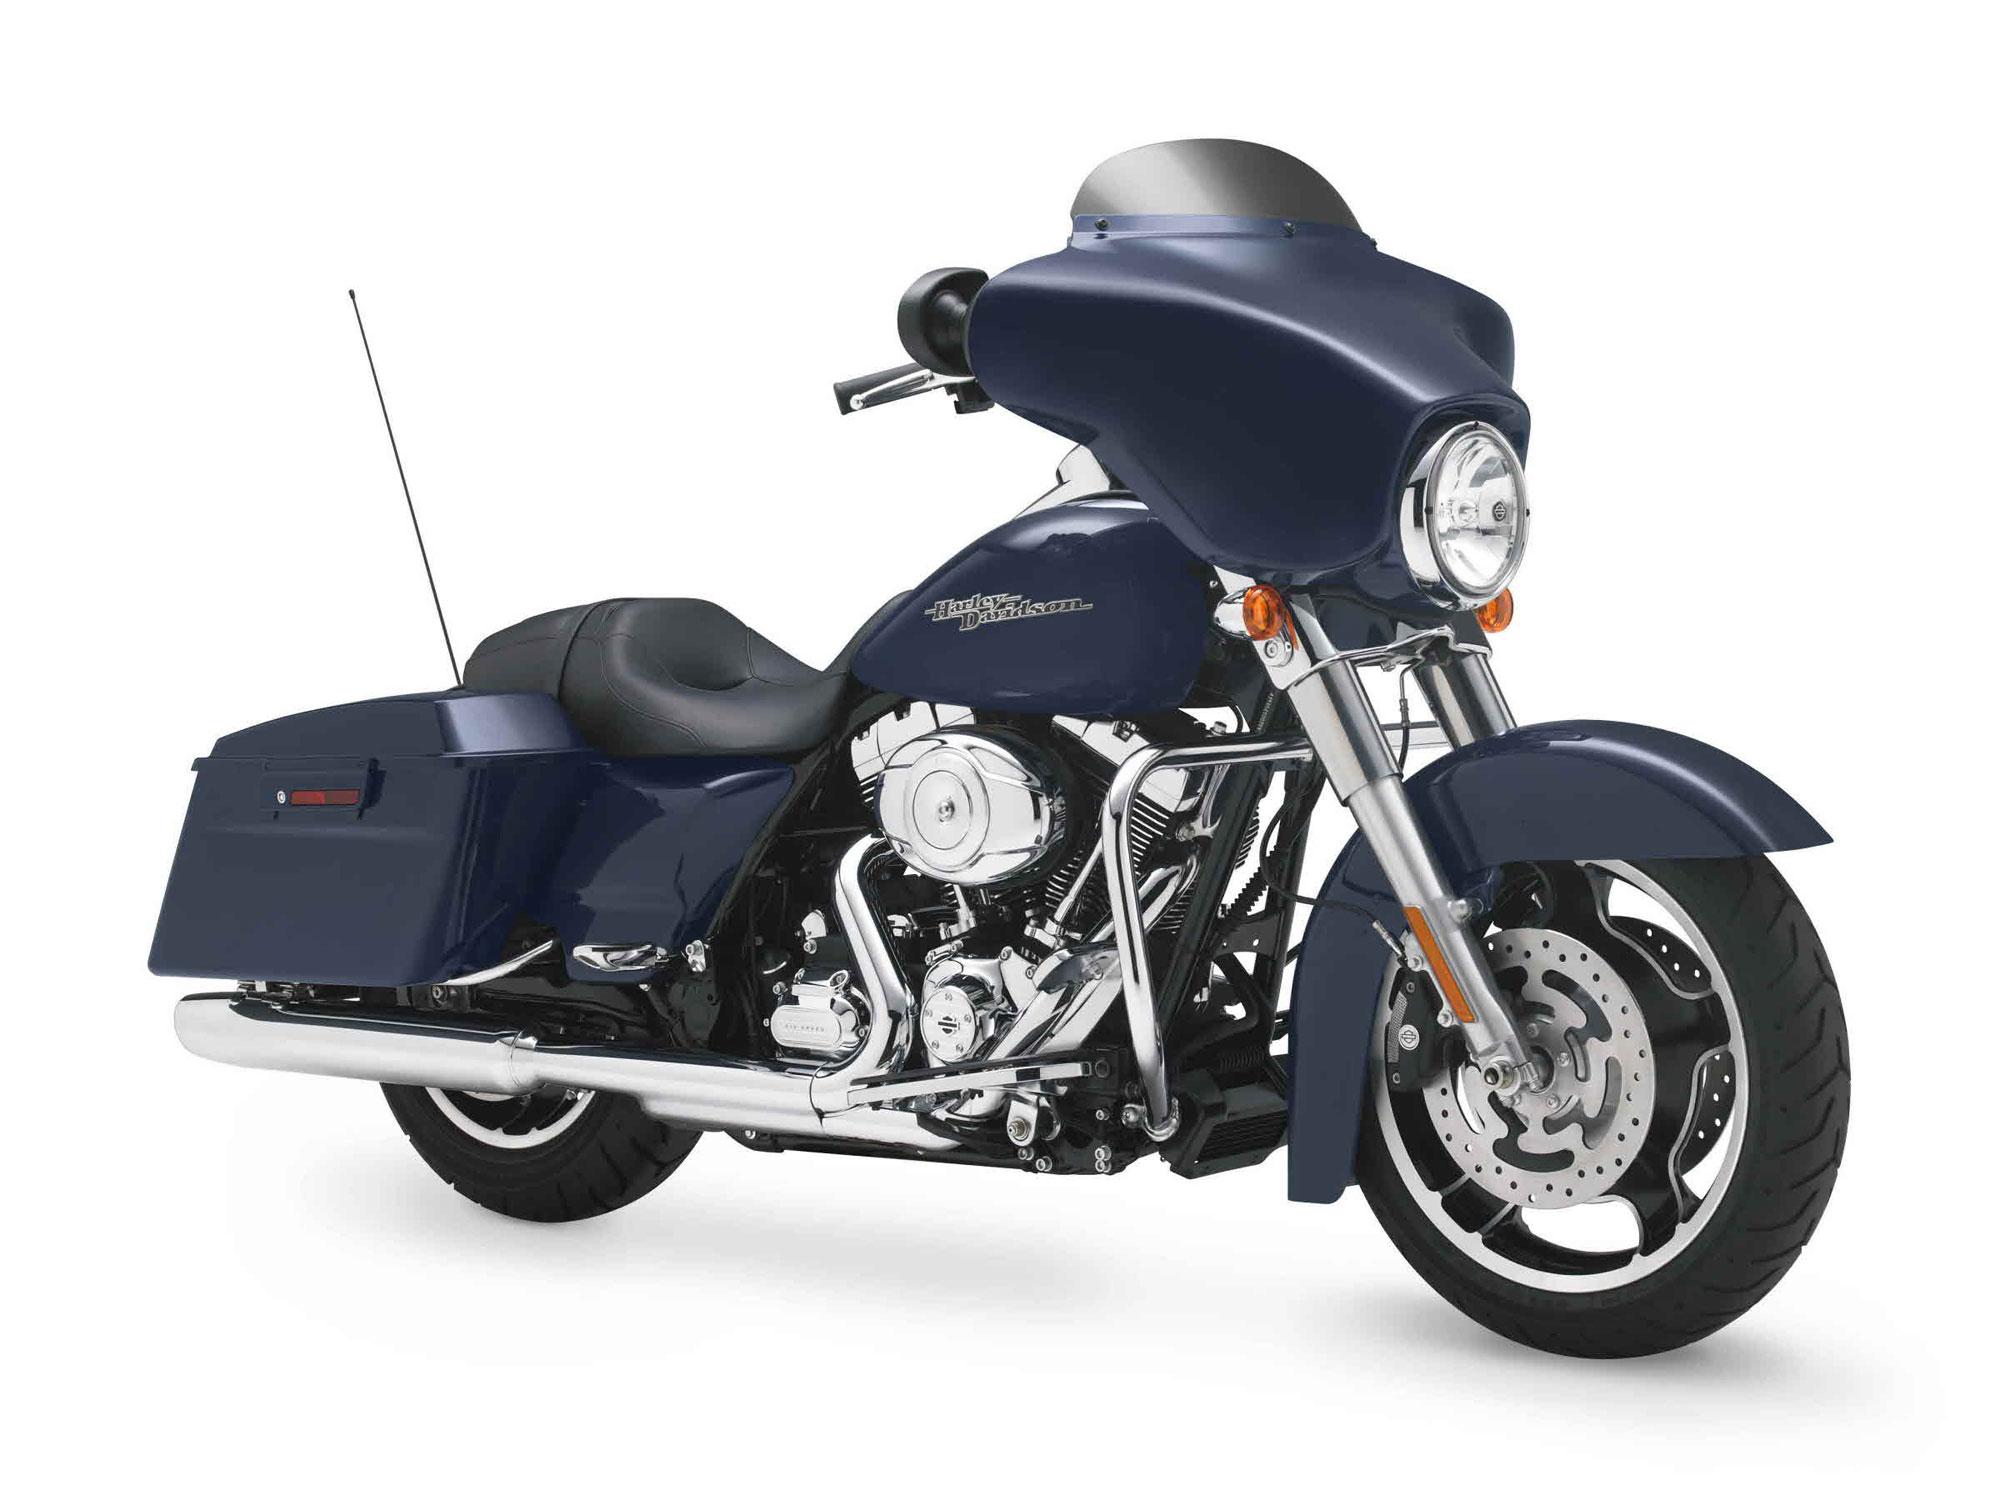 2012 Harley Davidson Flhx Street Glide F Wallpaper 2000x1500